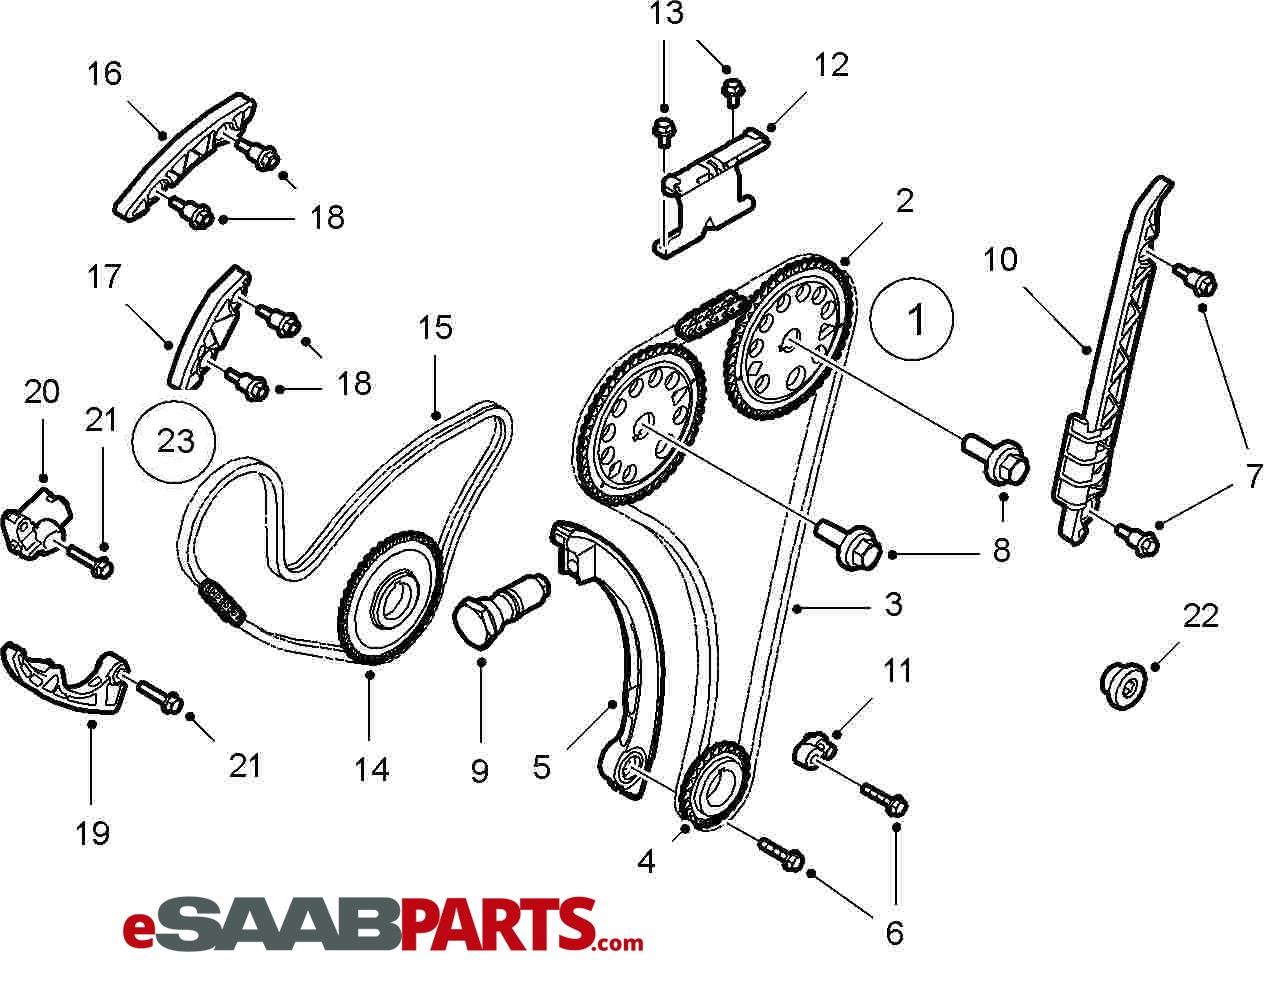 Diagram Saab 9 3 Viggen Wiring Diagram Full Version